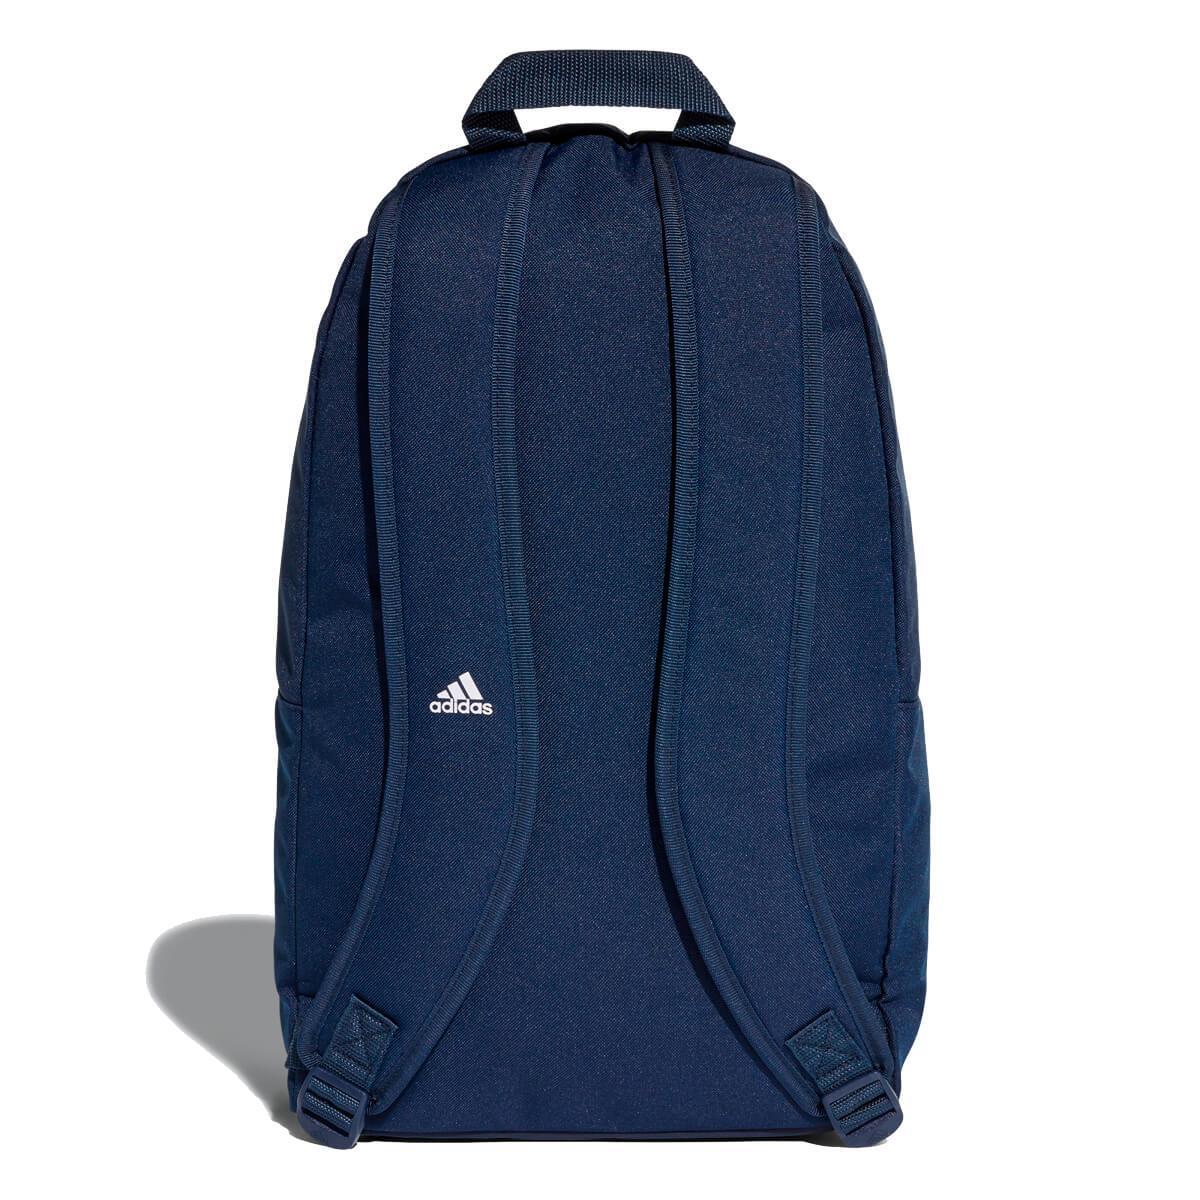 1dc19b9c9 Mochila Adidas Classic Azul